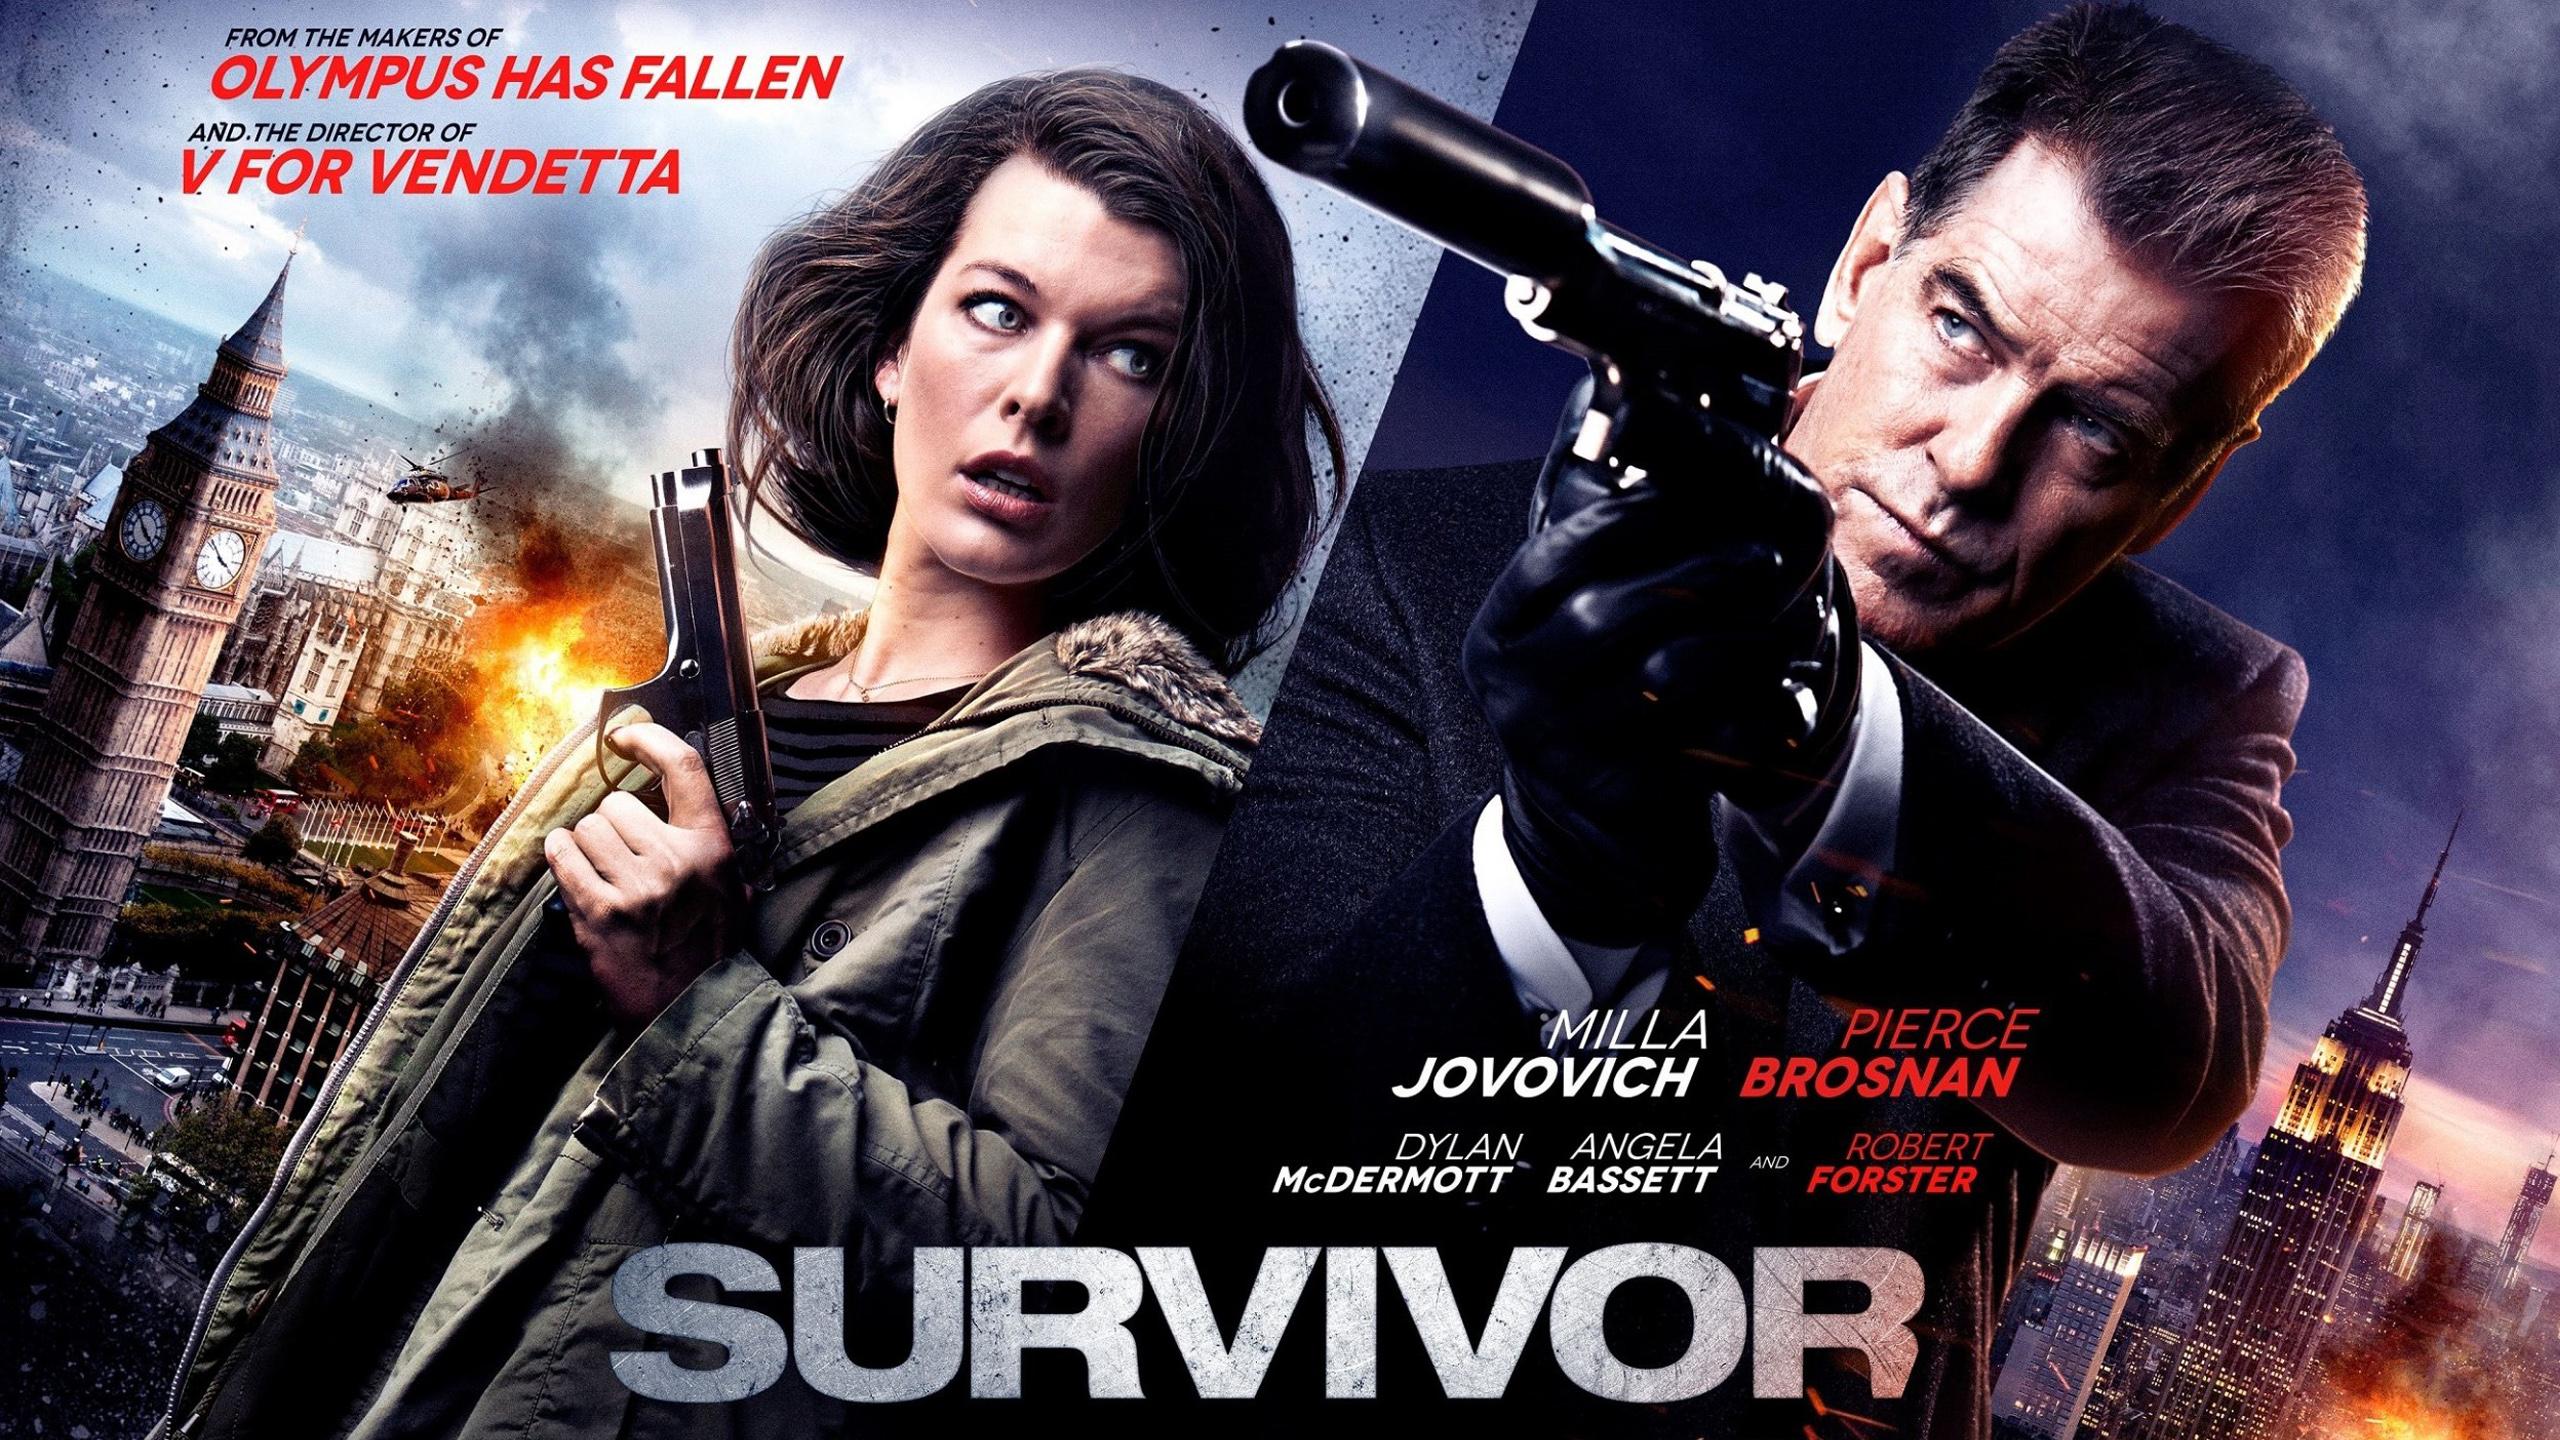 Survivor 2015 Movie Wallpapers  Hd Wallpapers  Id #14607